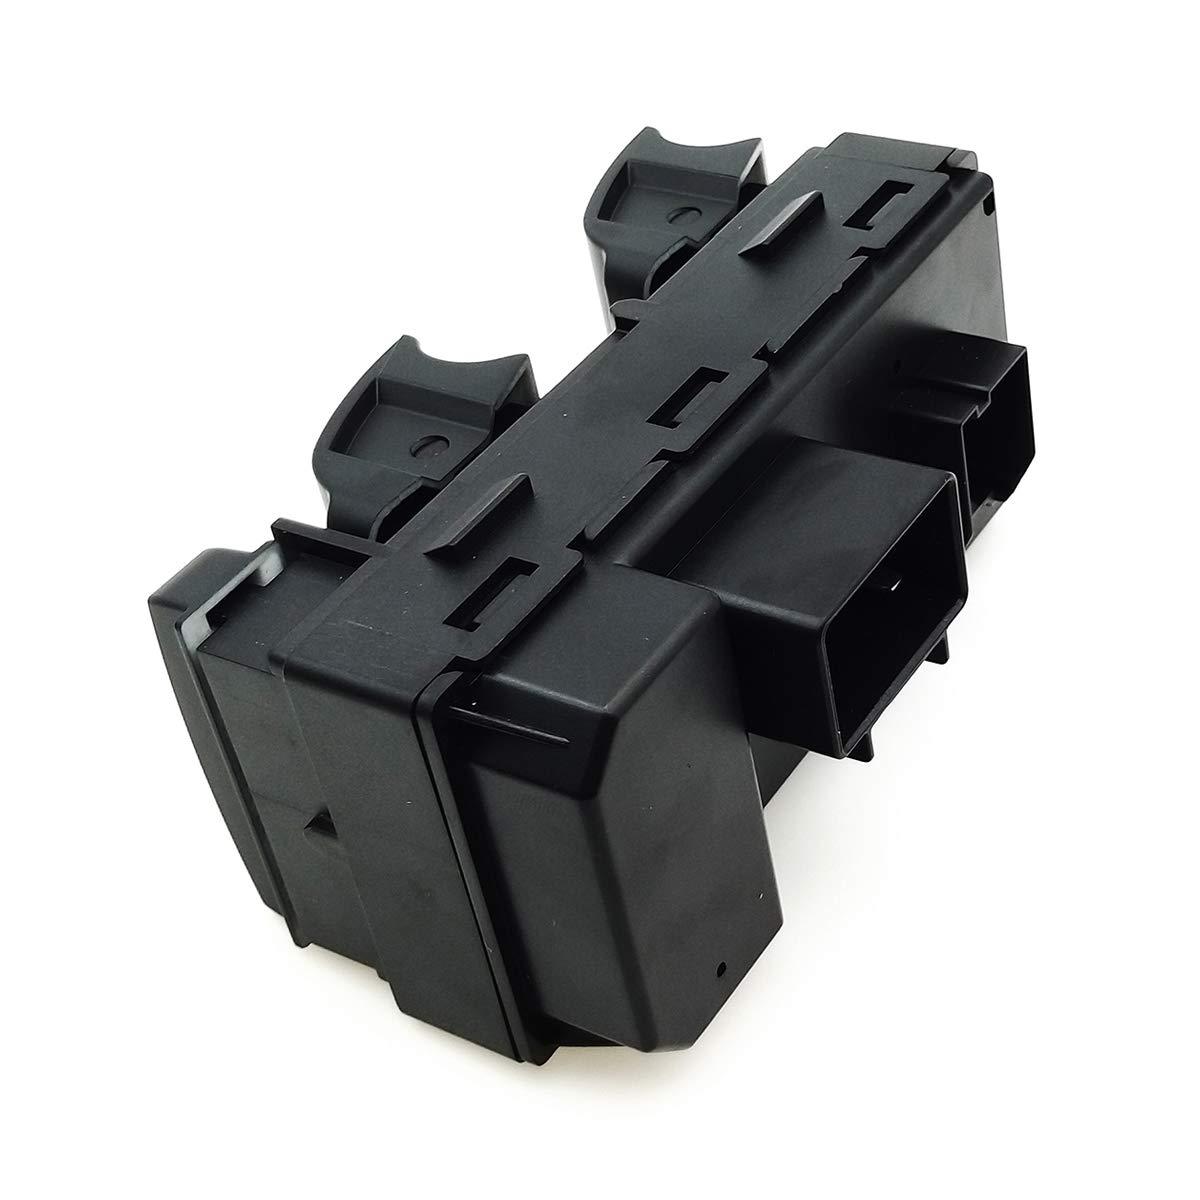 BOPART Driver Side Master Power Window Switch 20945129 25789692 for 2007-2013 Chevy Silverado GMC Sierra 1500 /& 2500//3500 HD 2009-2014 Chevrolet Traverse /& 2008-2011 HHR 2009-2013 Buick Enclave